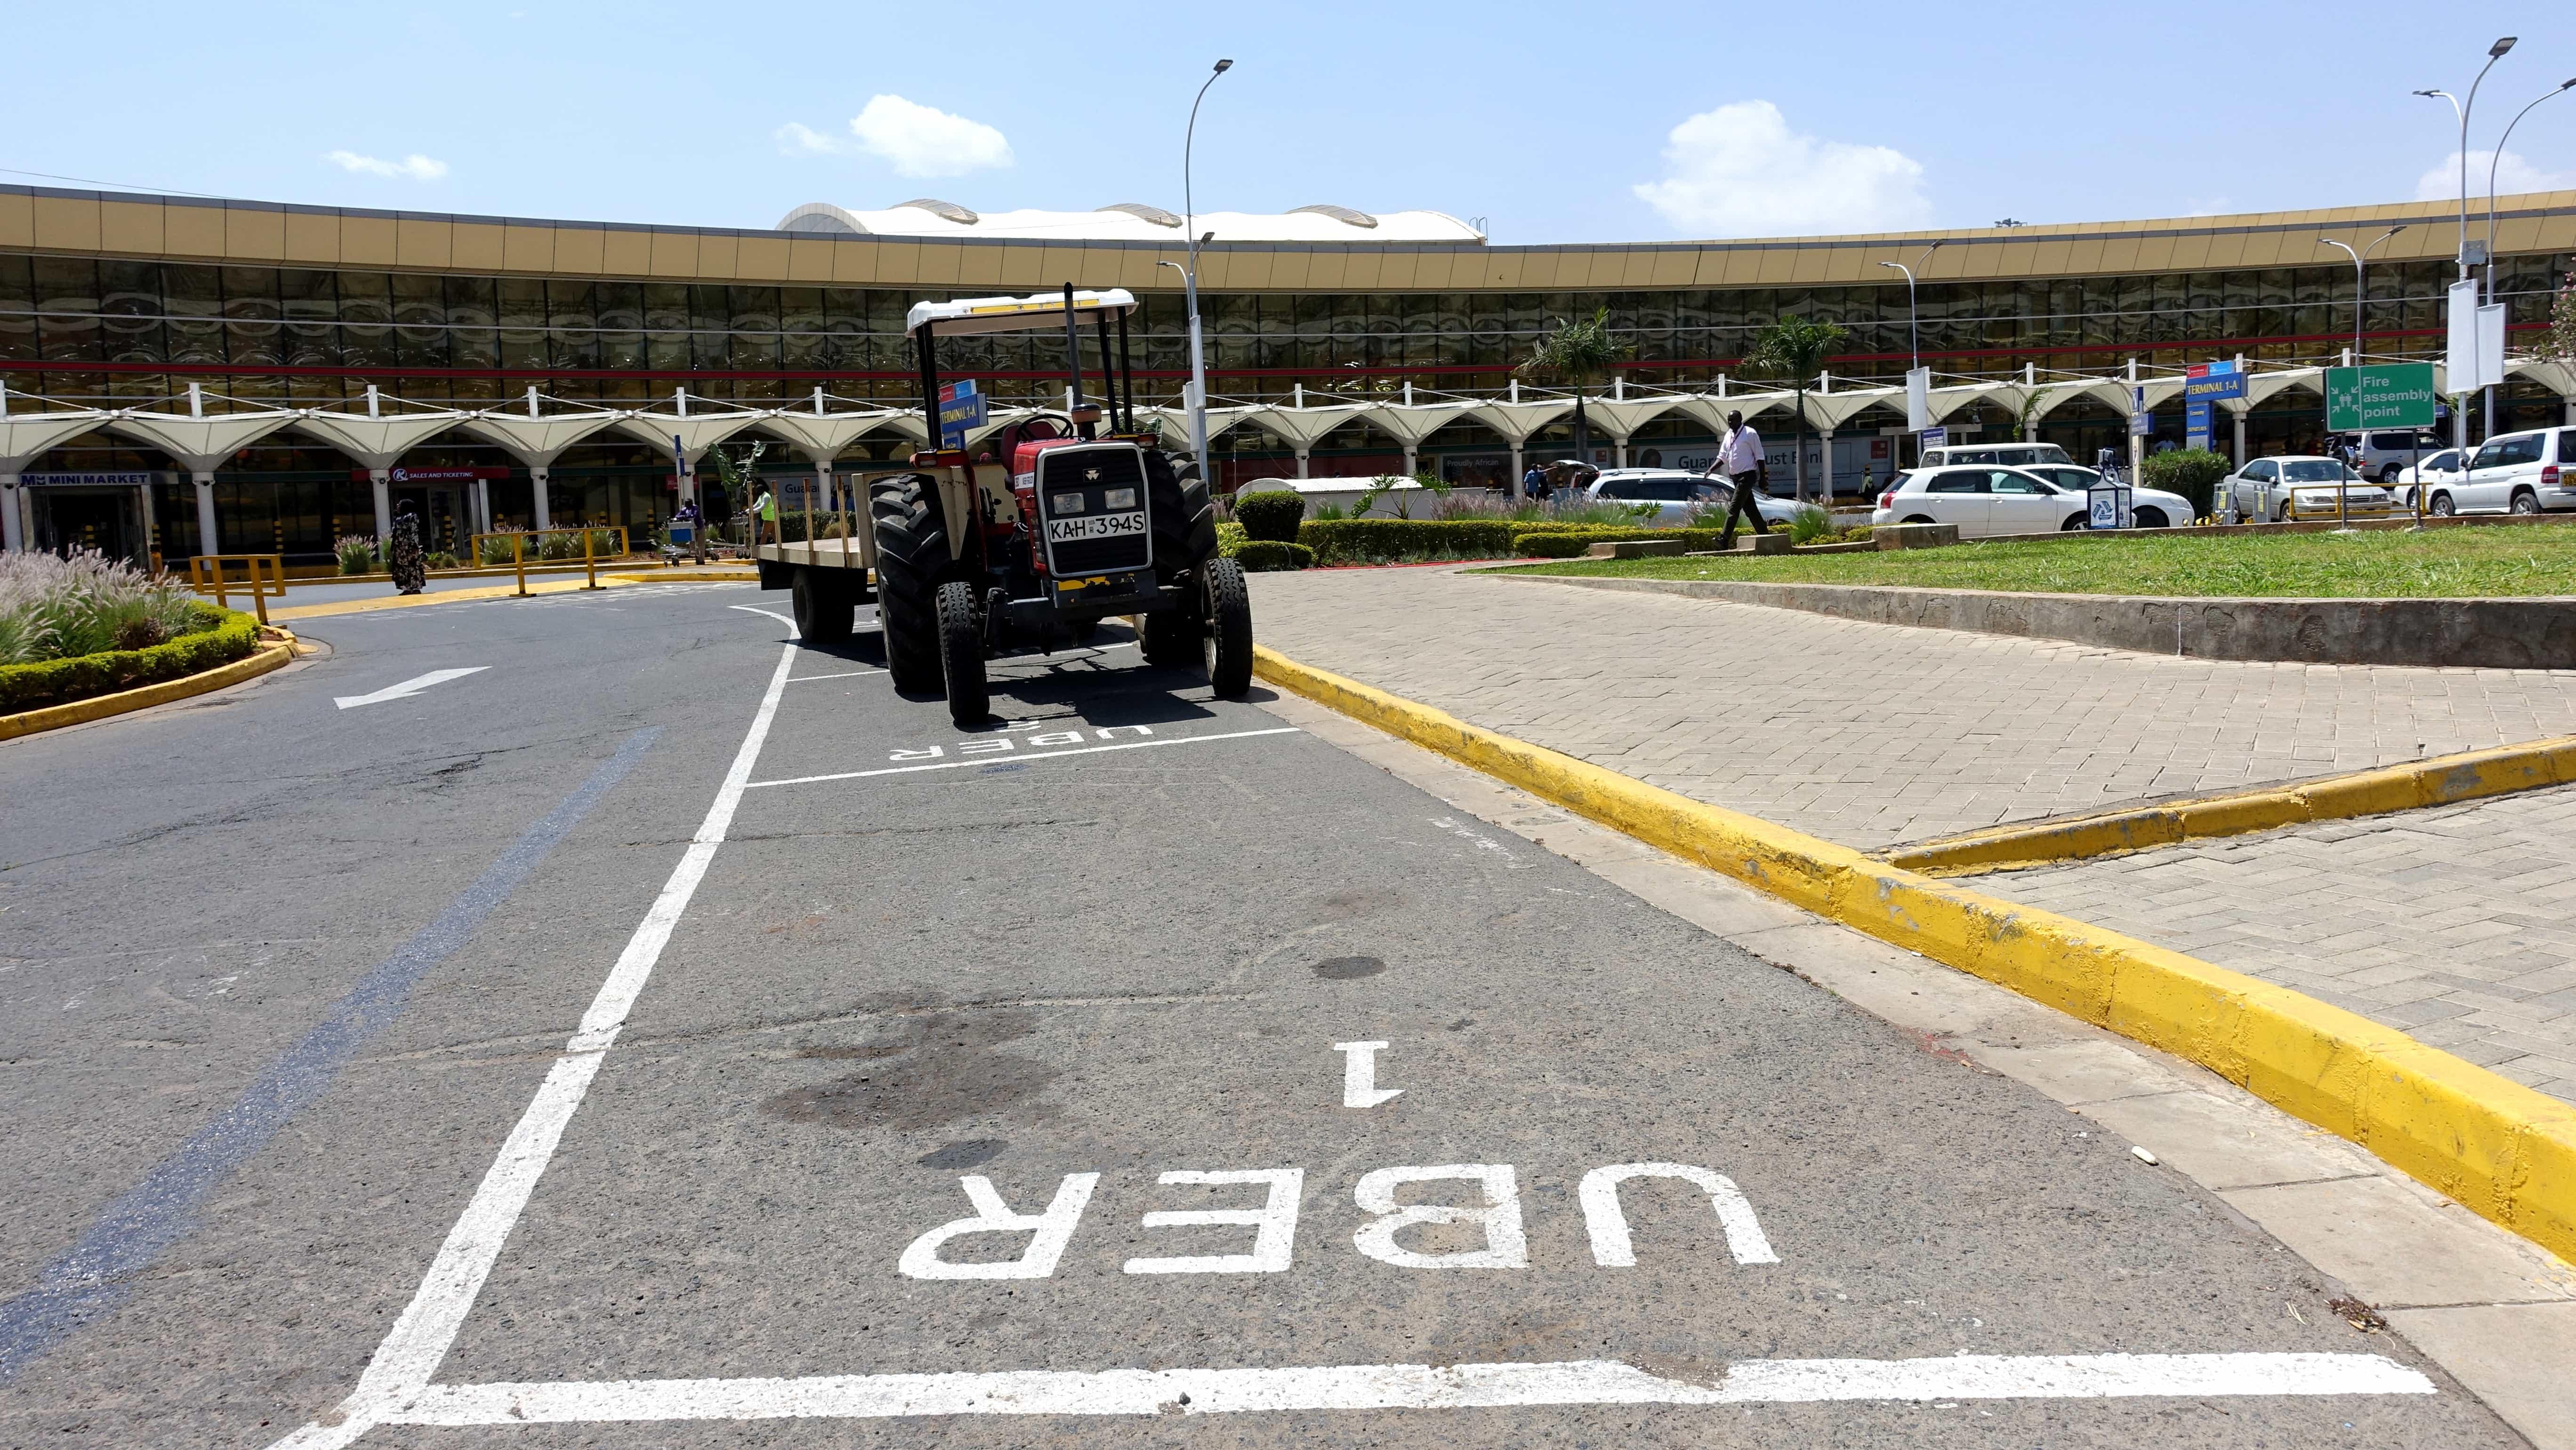 Uber vor dem Flughafen Nairobi in Kenia